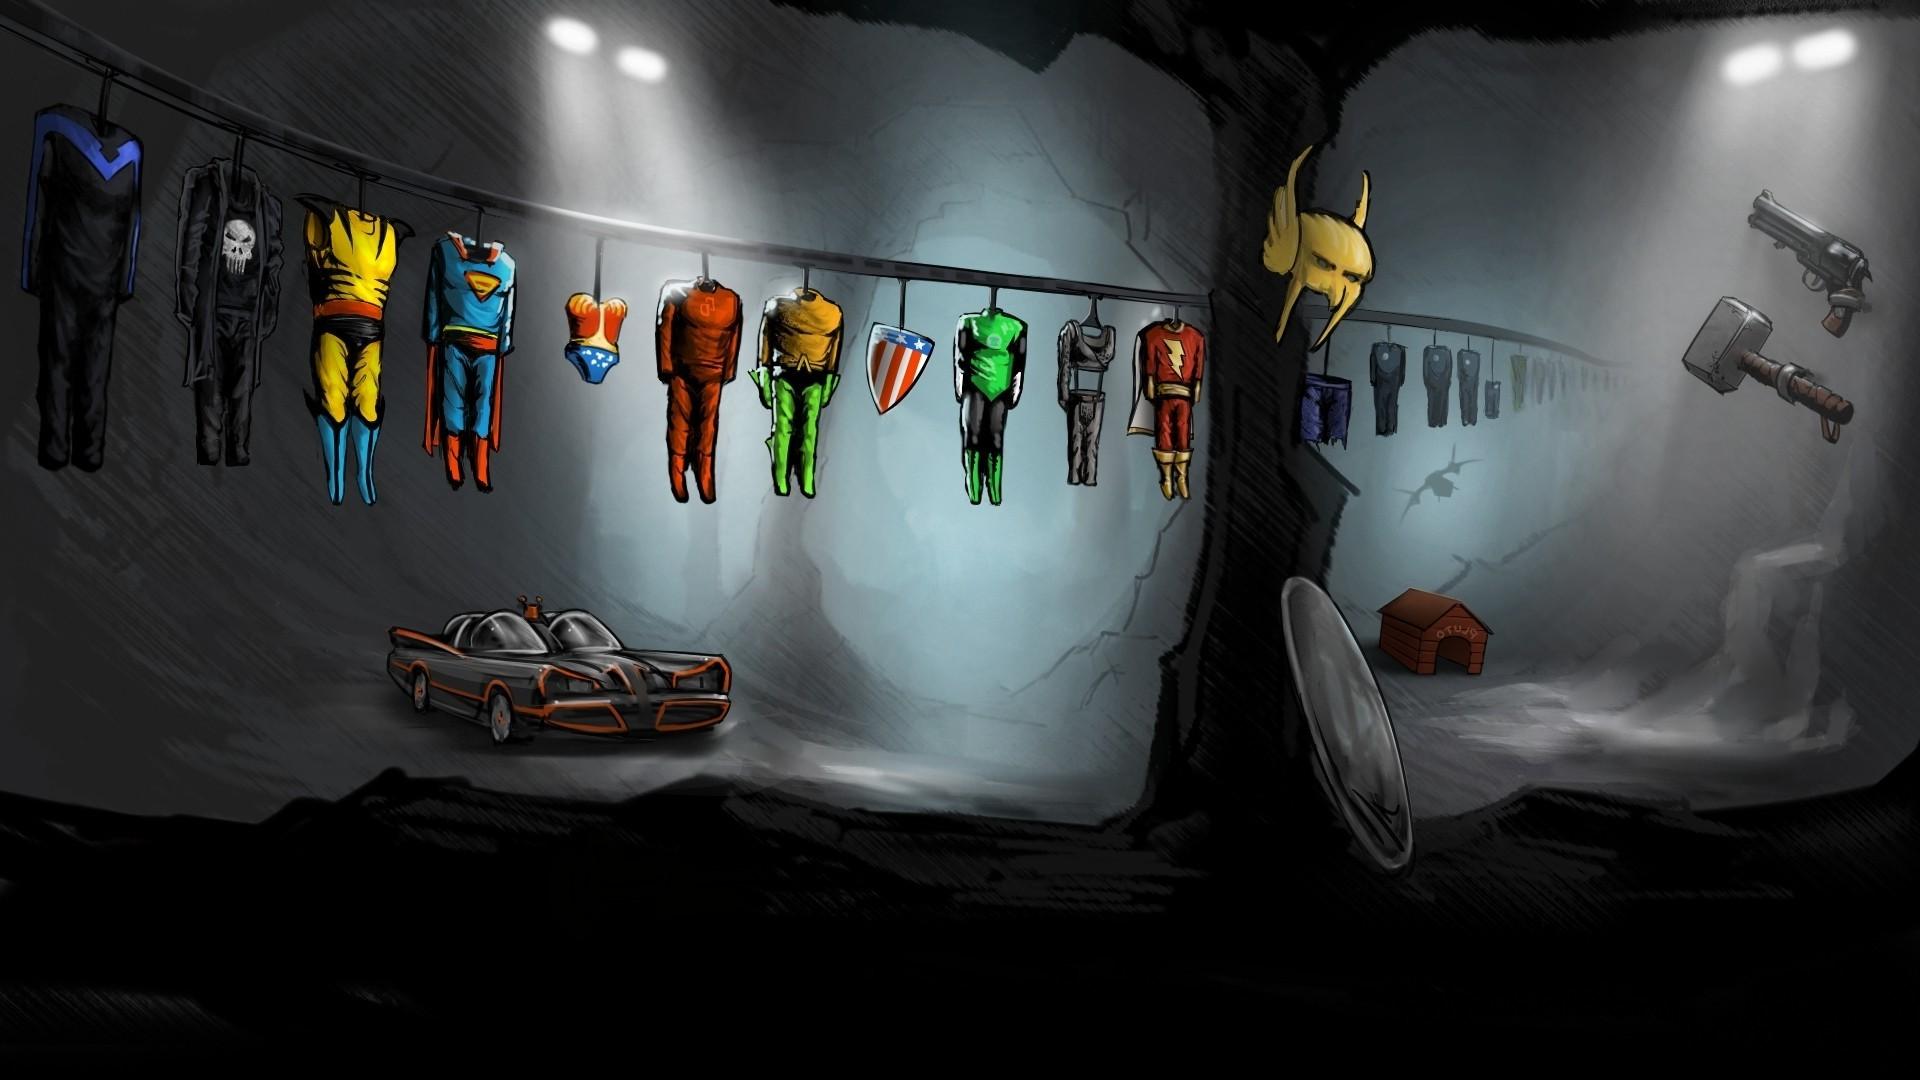 Wallpaper Digital Art Space Weapon Artwork Batman Helmet